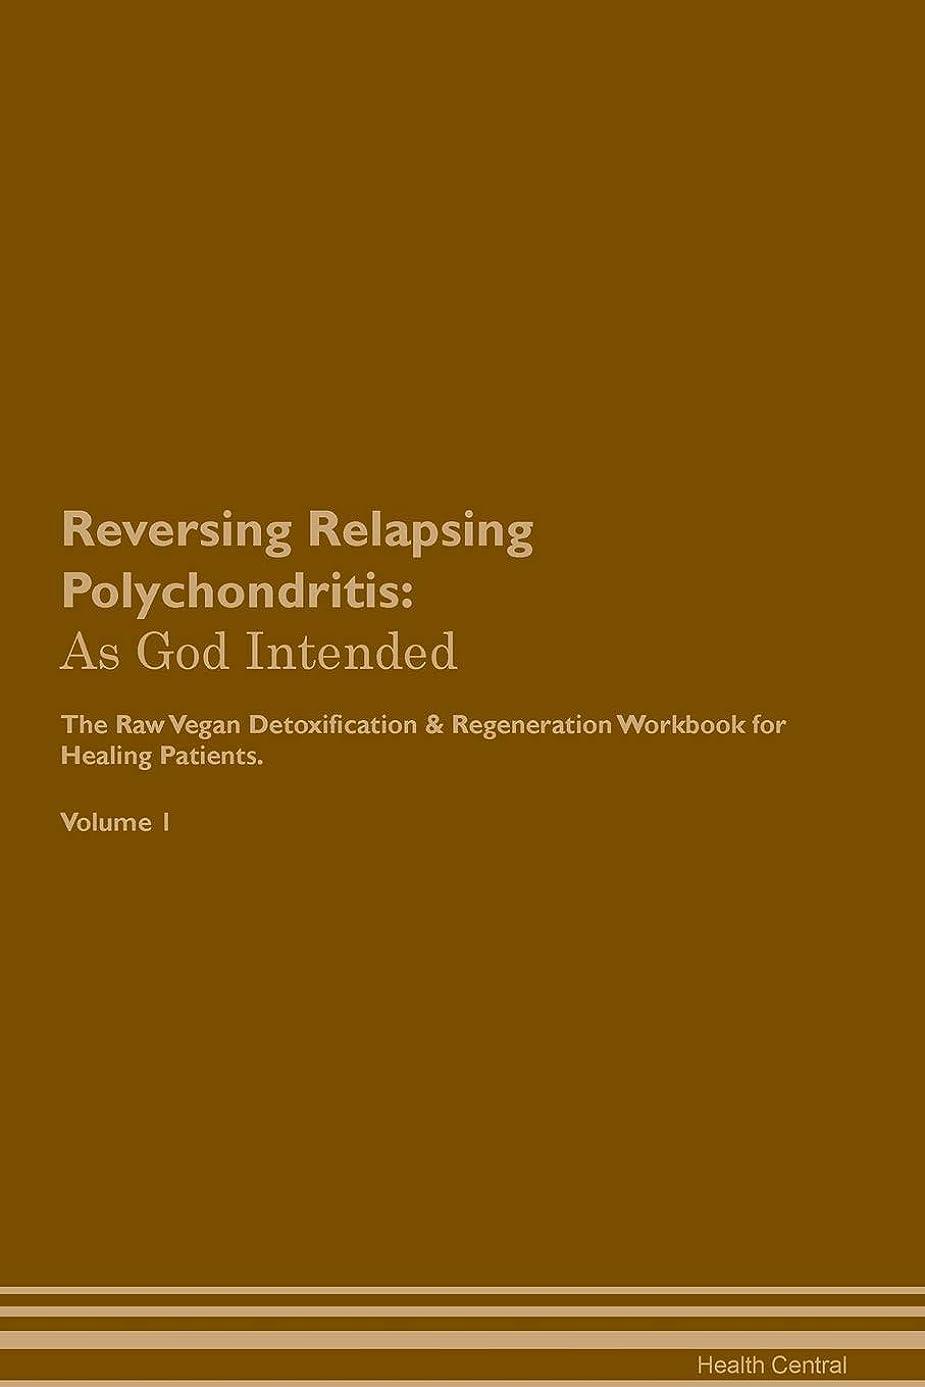 Reversing Relapsing Polychondritis: As God Intended the Raw Vegan Plant-Based Detoxification & Regeneration Workbook for Healing Patients. Volume 1